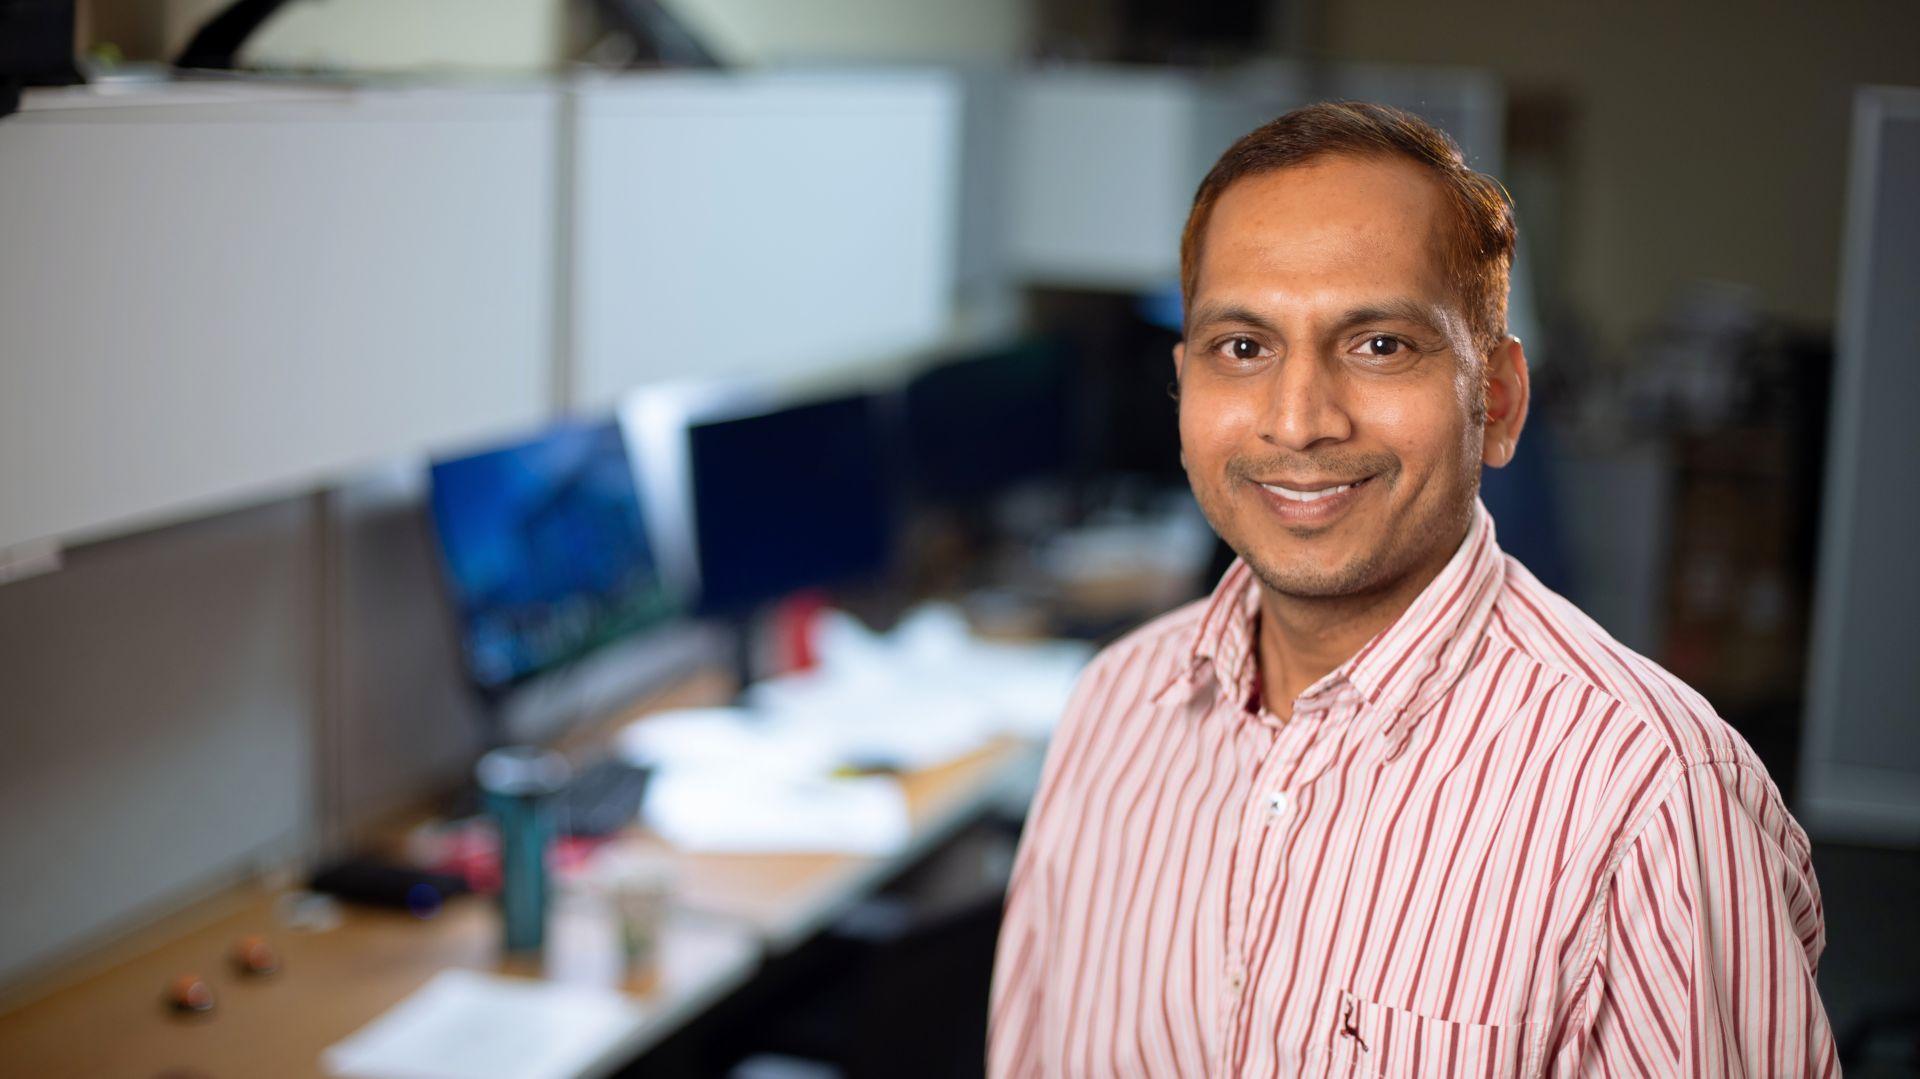 Surendhar Reddy Chepyala, PhD